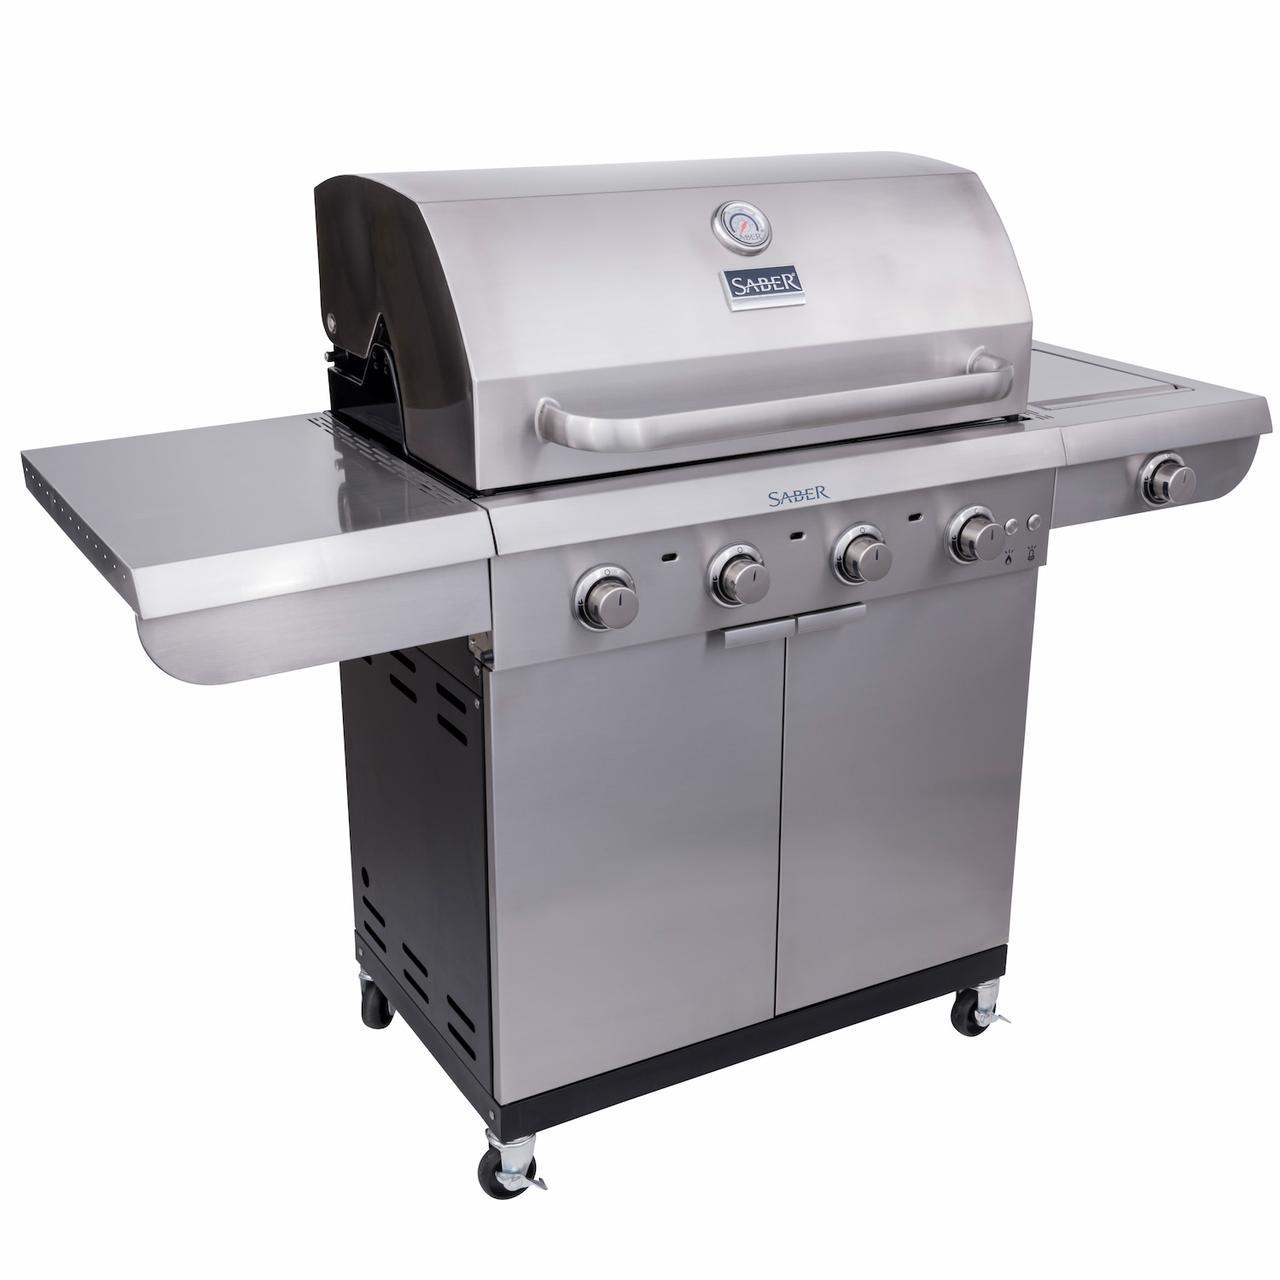 Газовый гриль Saber Select 4-Burner Gas Grill